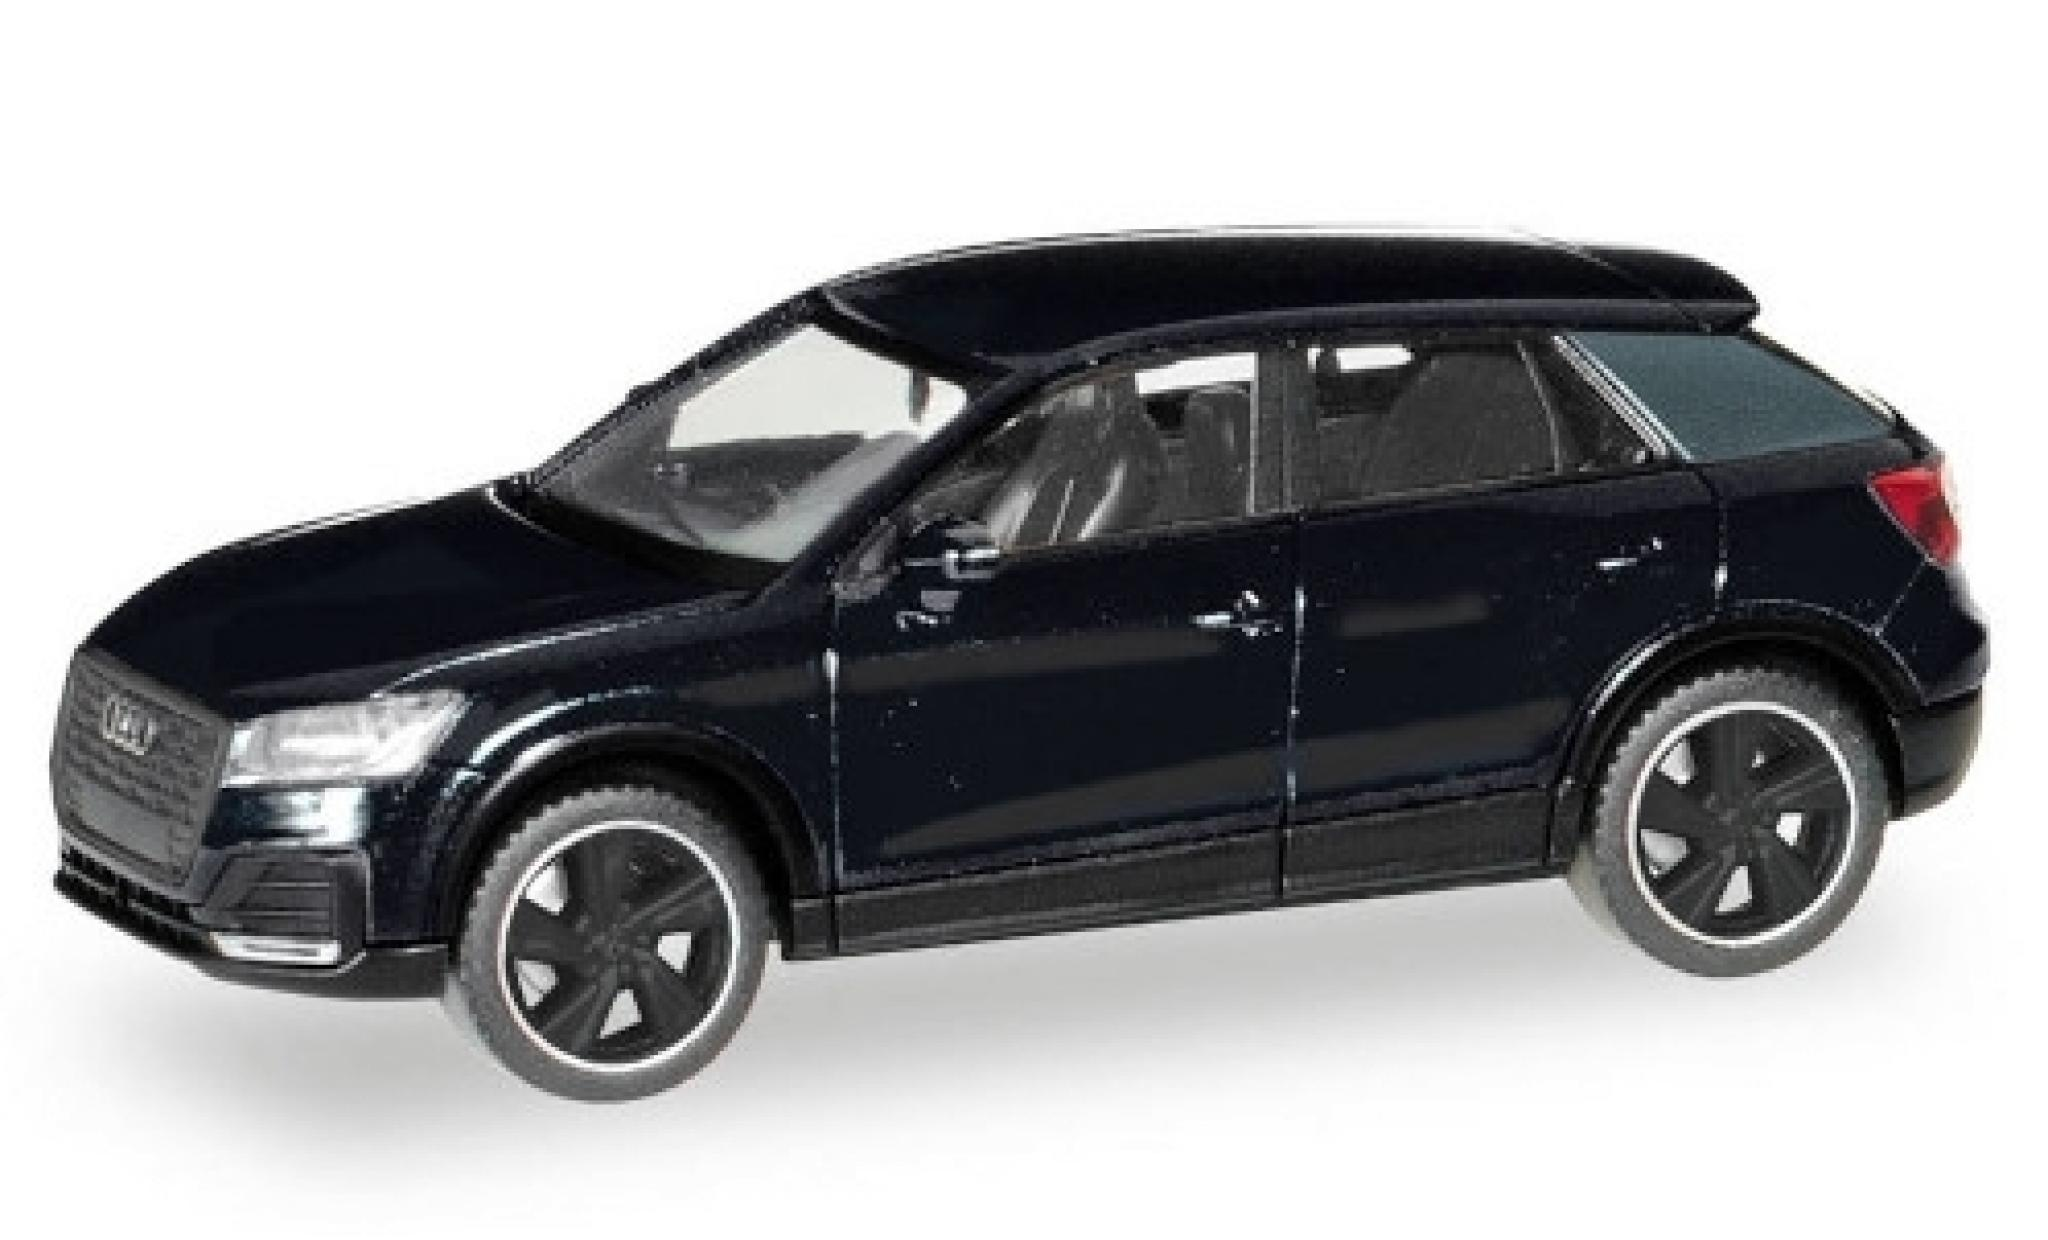 Audi Q2 1/87 Herpa black Black Edition